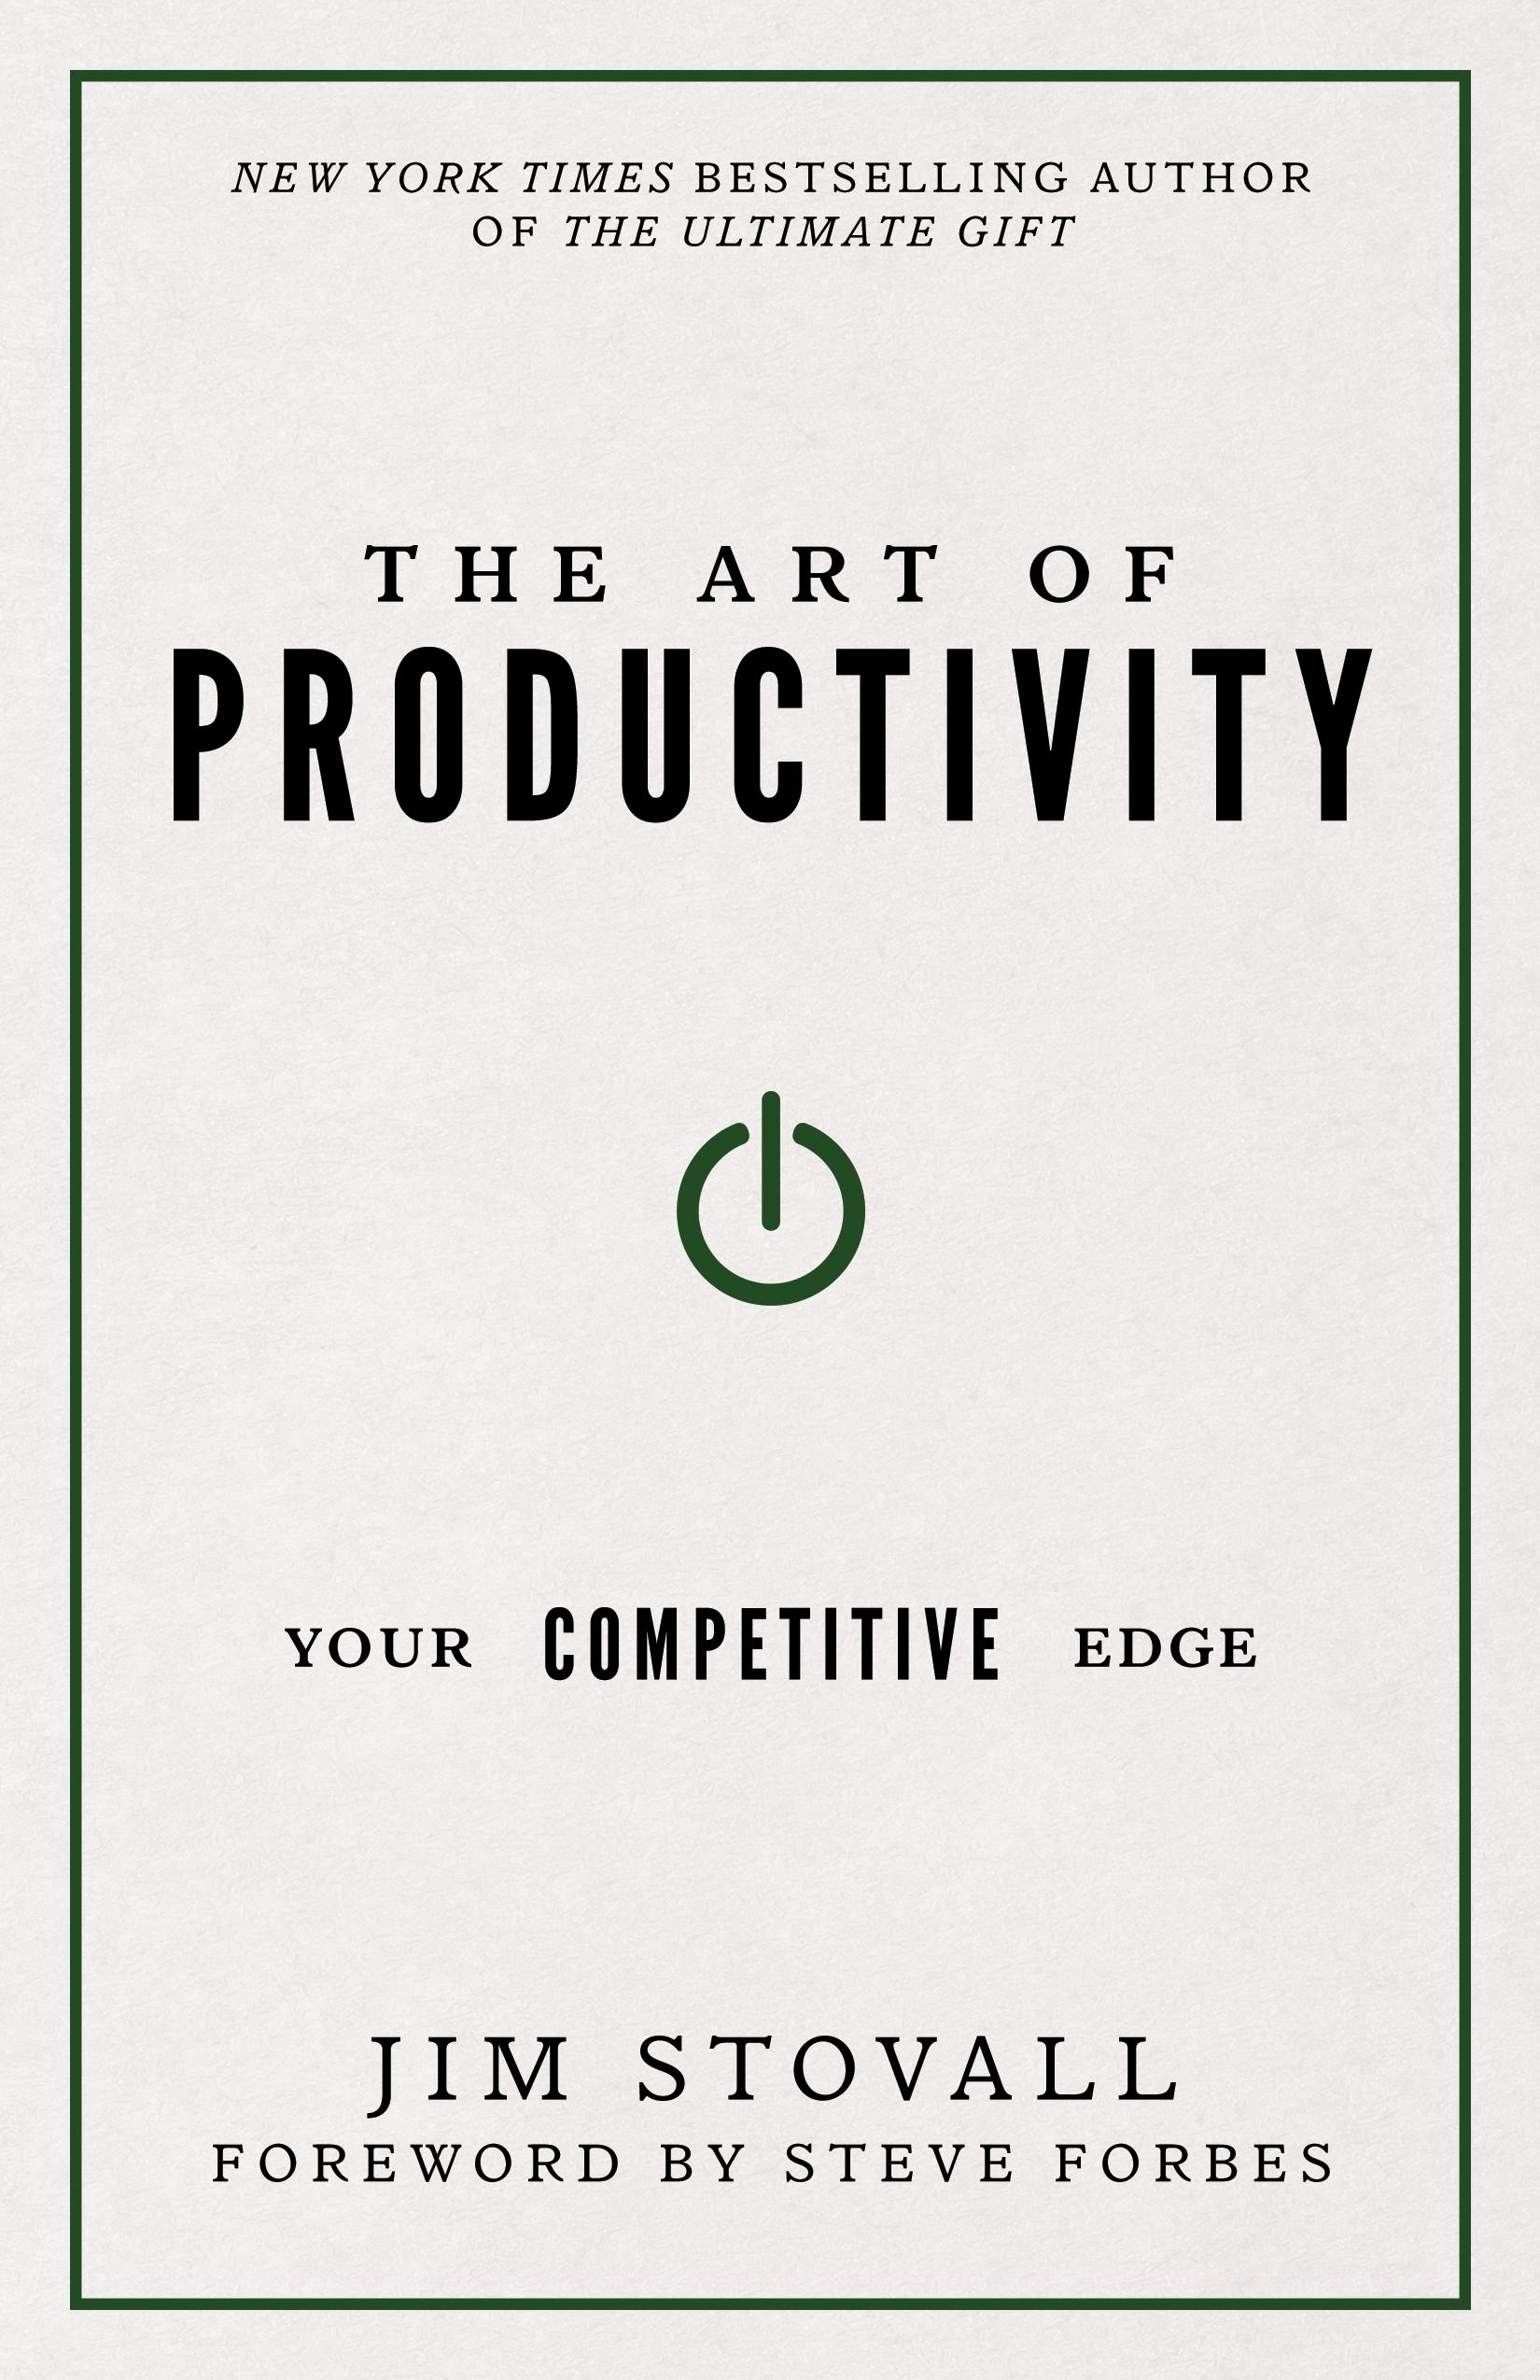 The Art of Productivity - Jim Stovall